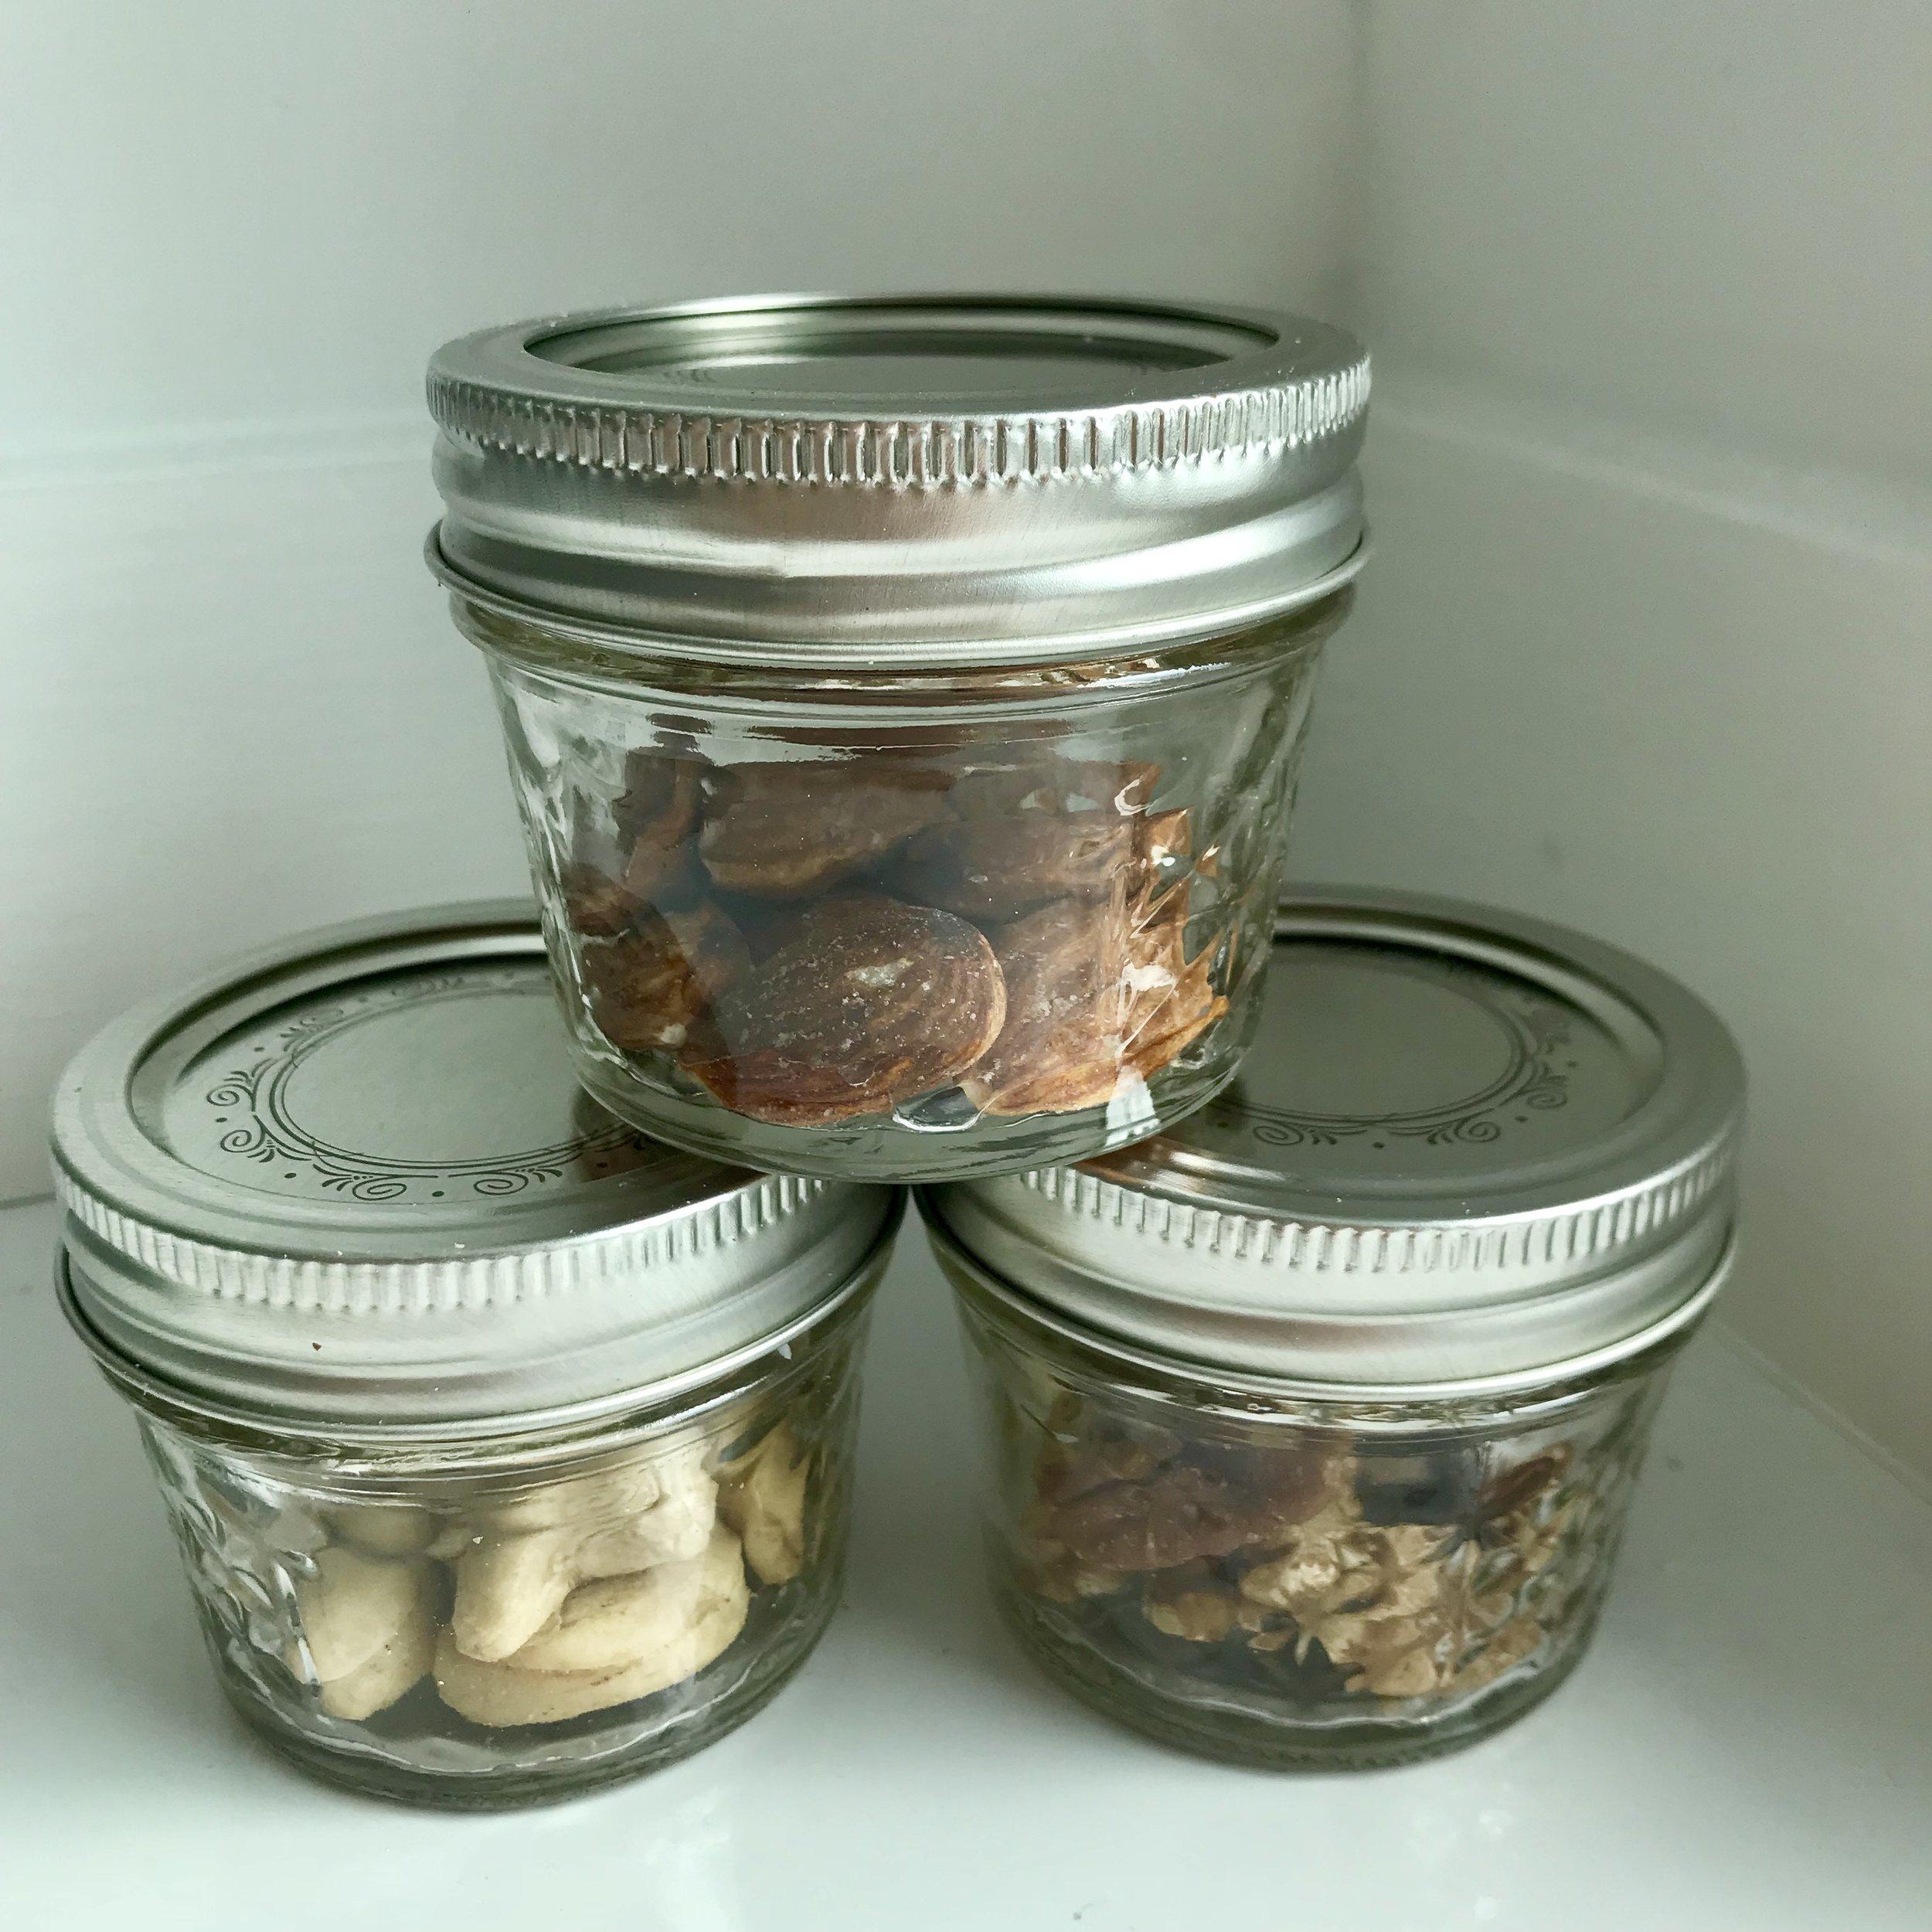 100-calorie-nut-jars.jpg